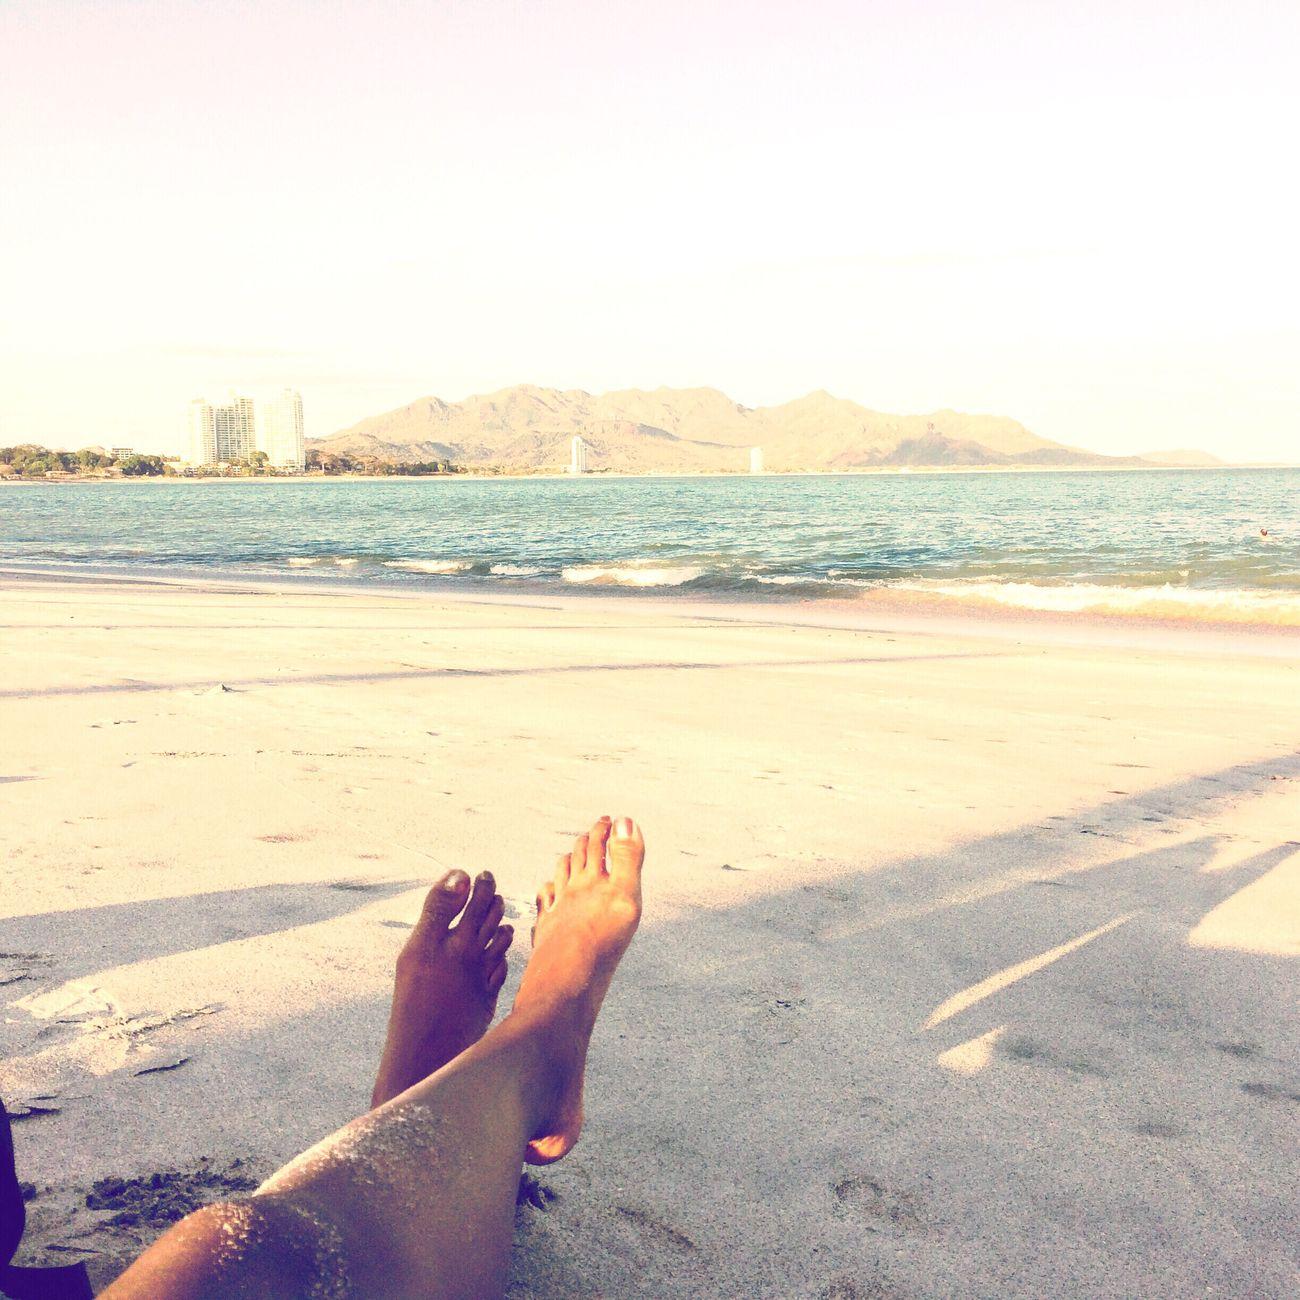 Sandy legs at the beach. Panamá Beach Legs Sand Sandy Ocean Shore Coronado Vacation Leisure Relaxation Horizon The Essence Of Summer